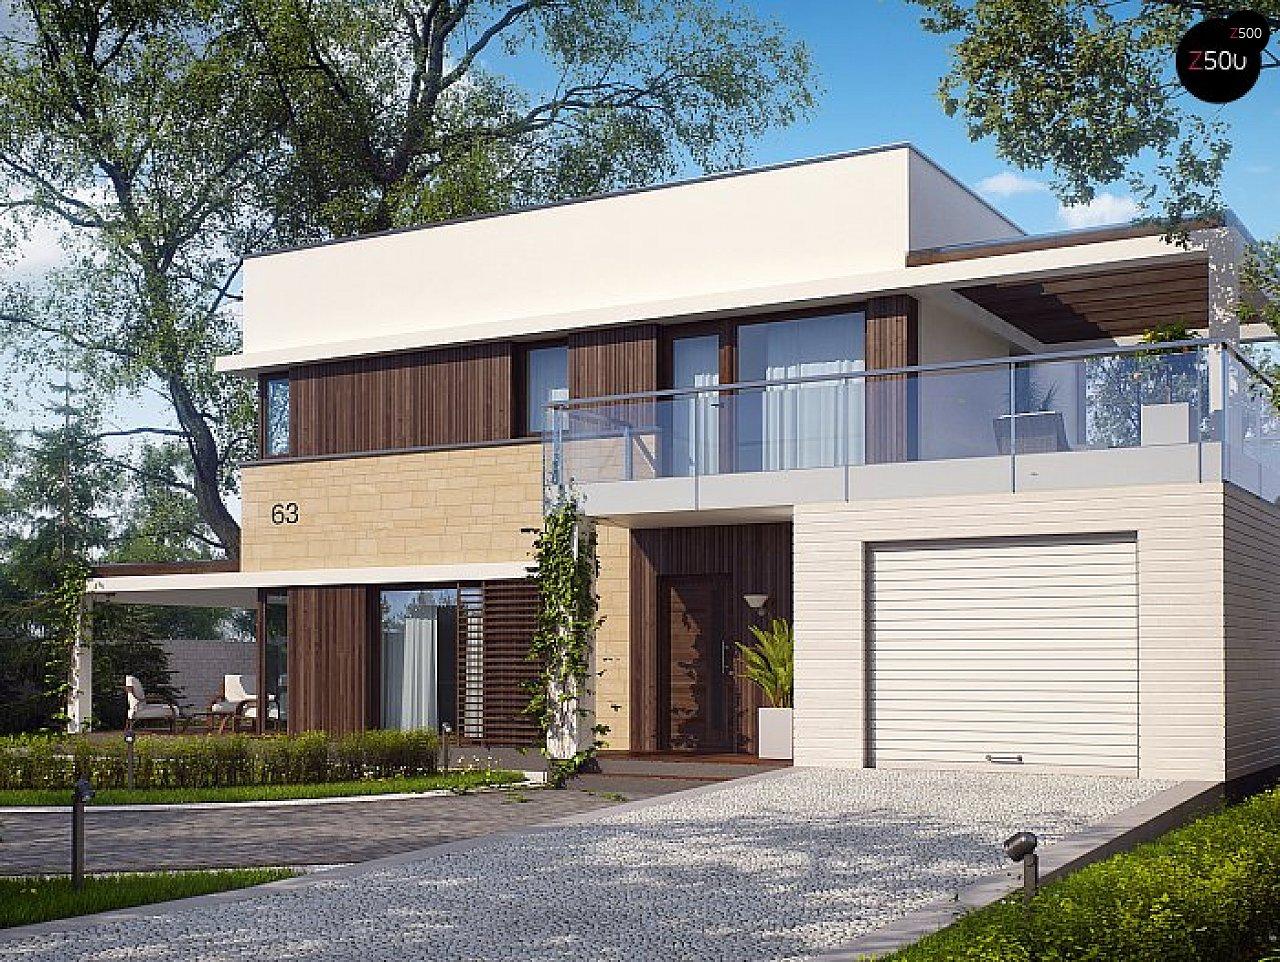 Проект будинку Zx63 s - 1